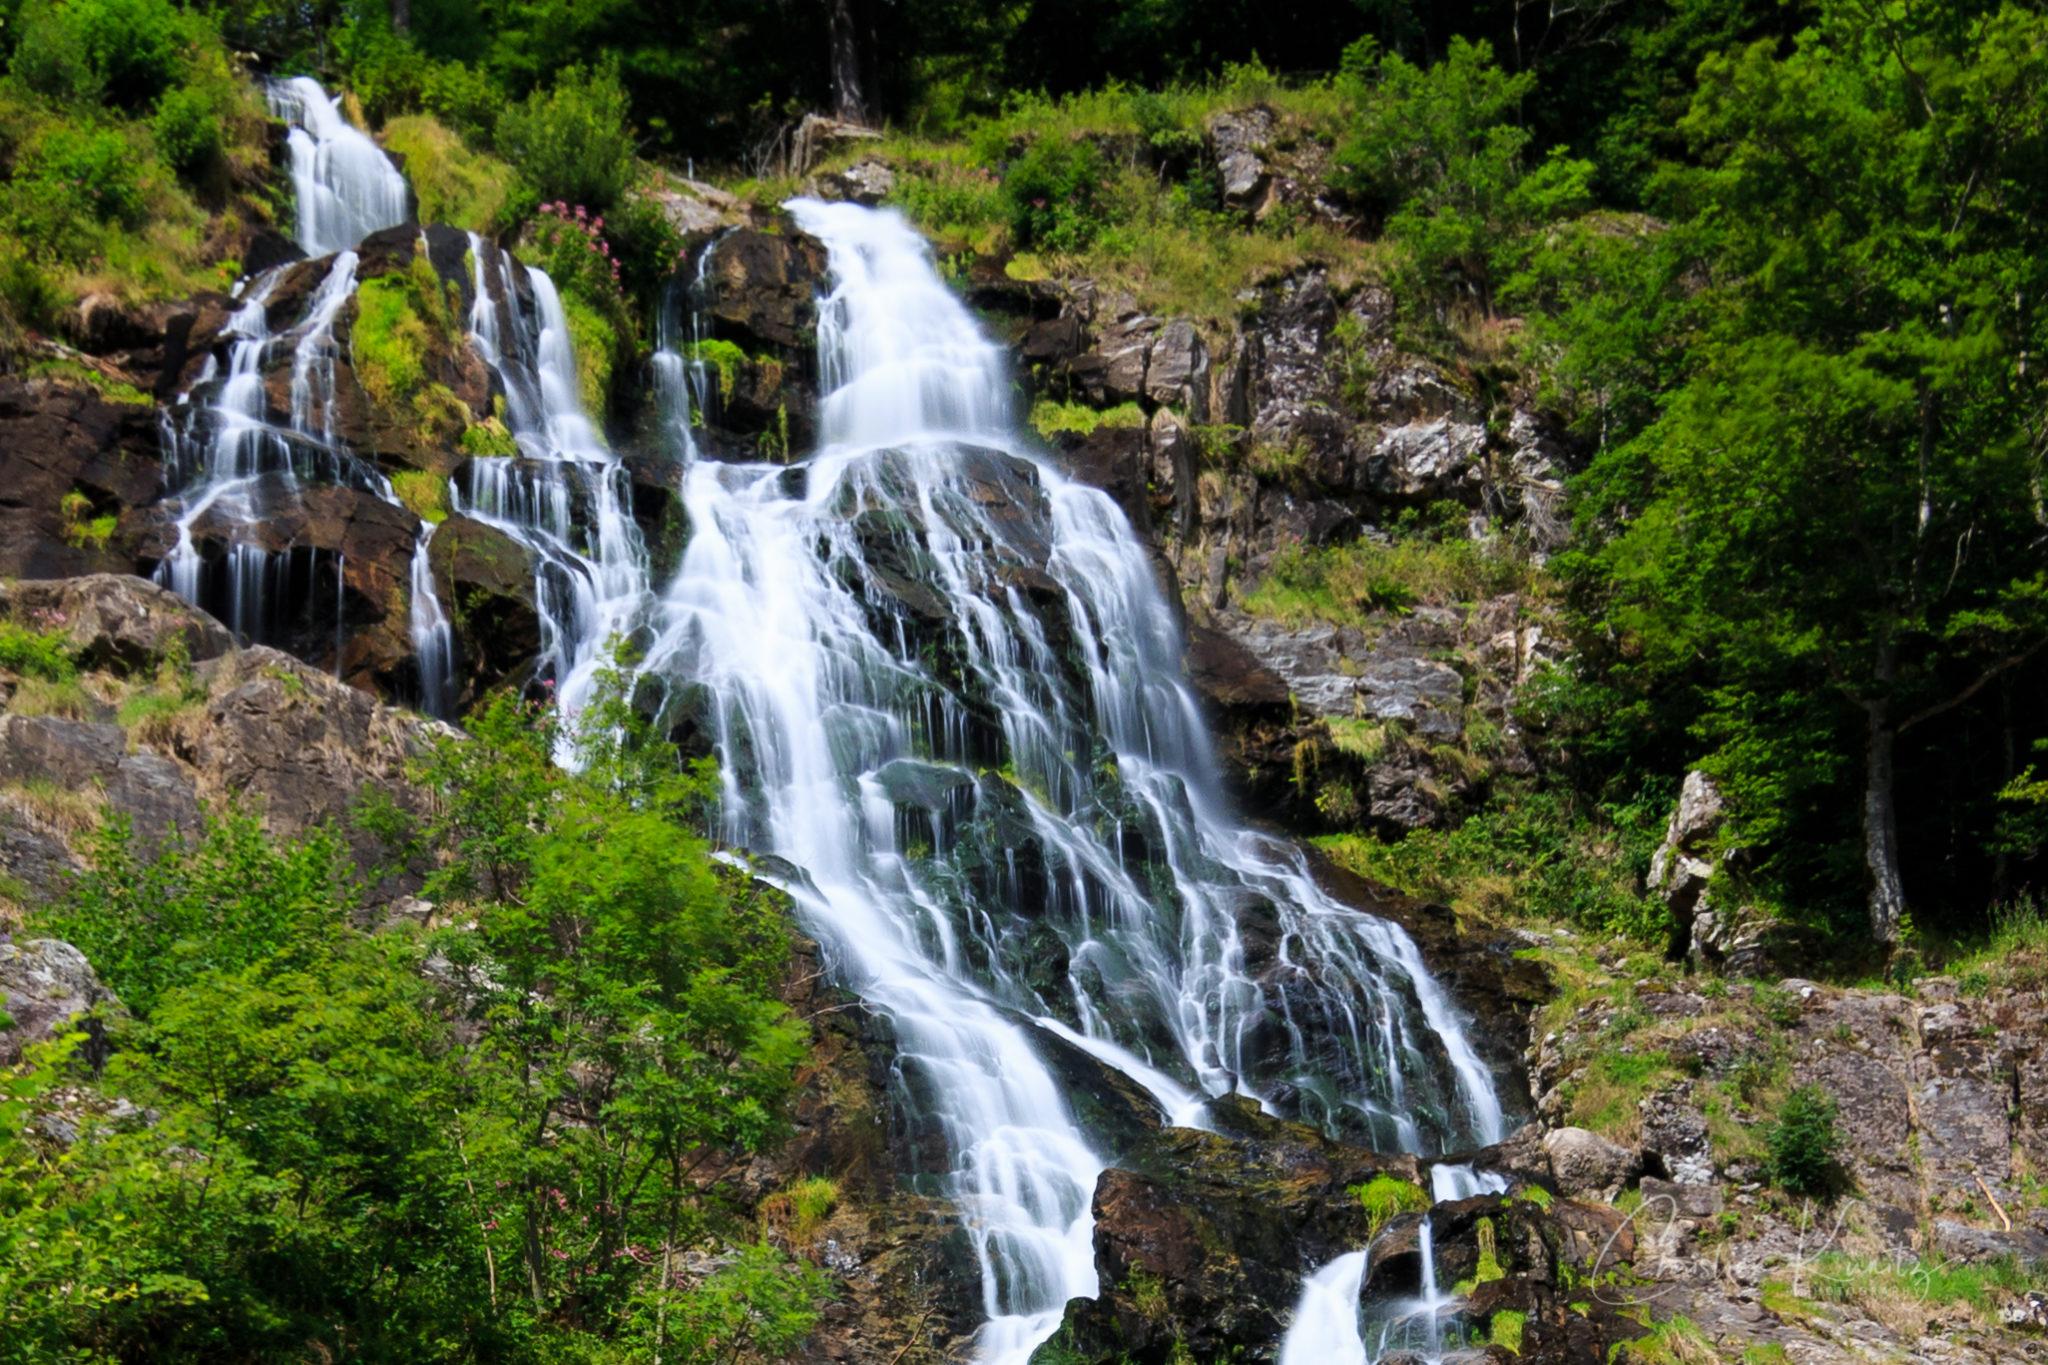 Todtnauer Wasserfall I